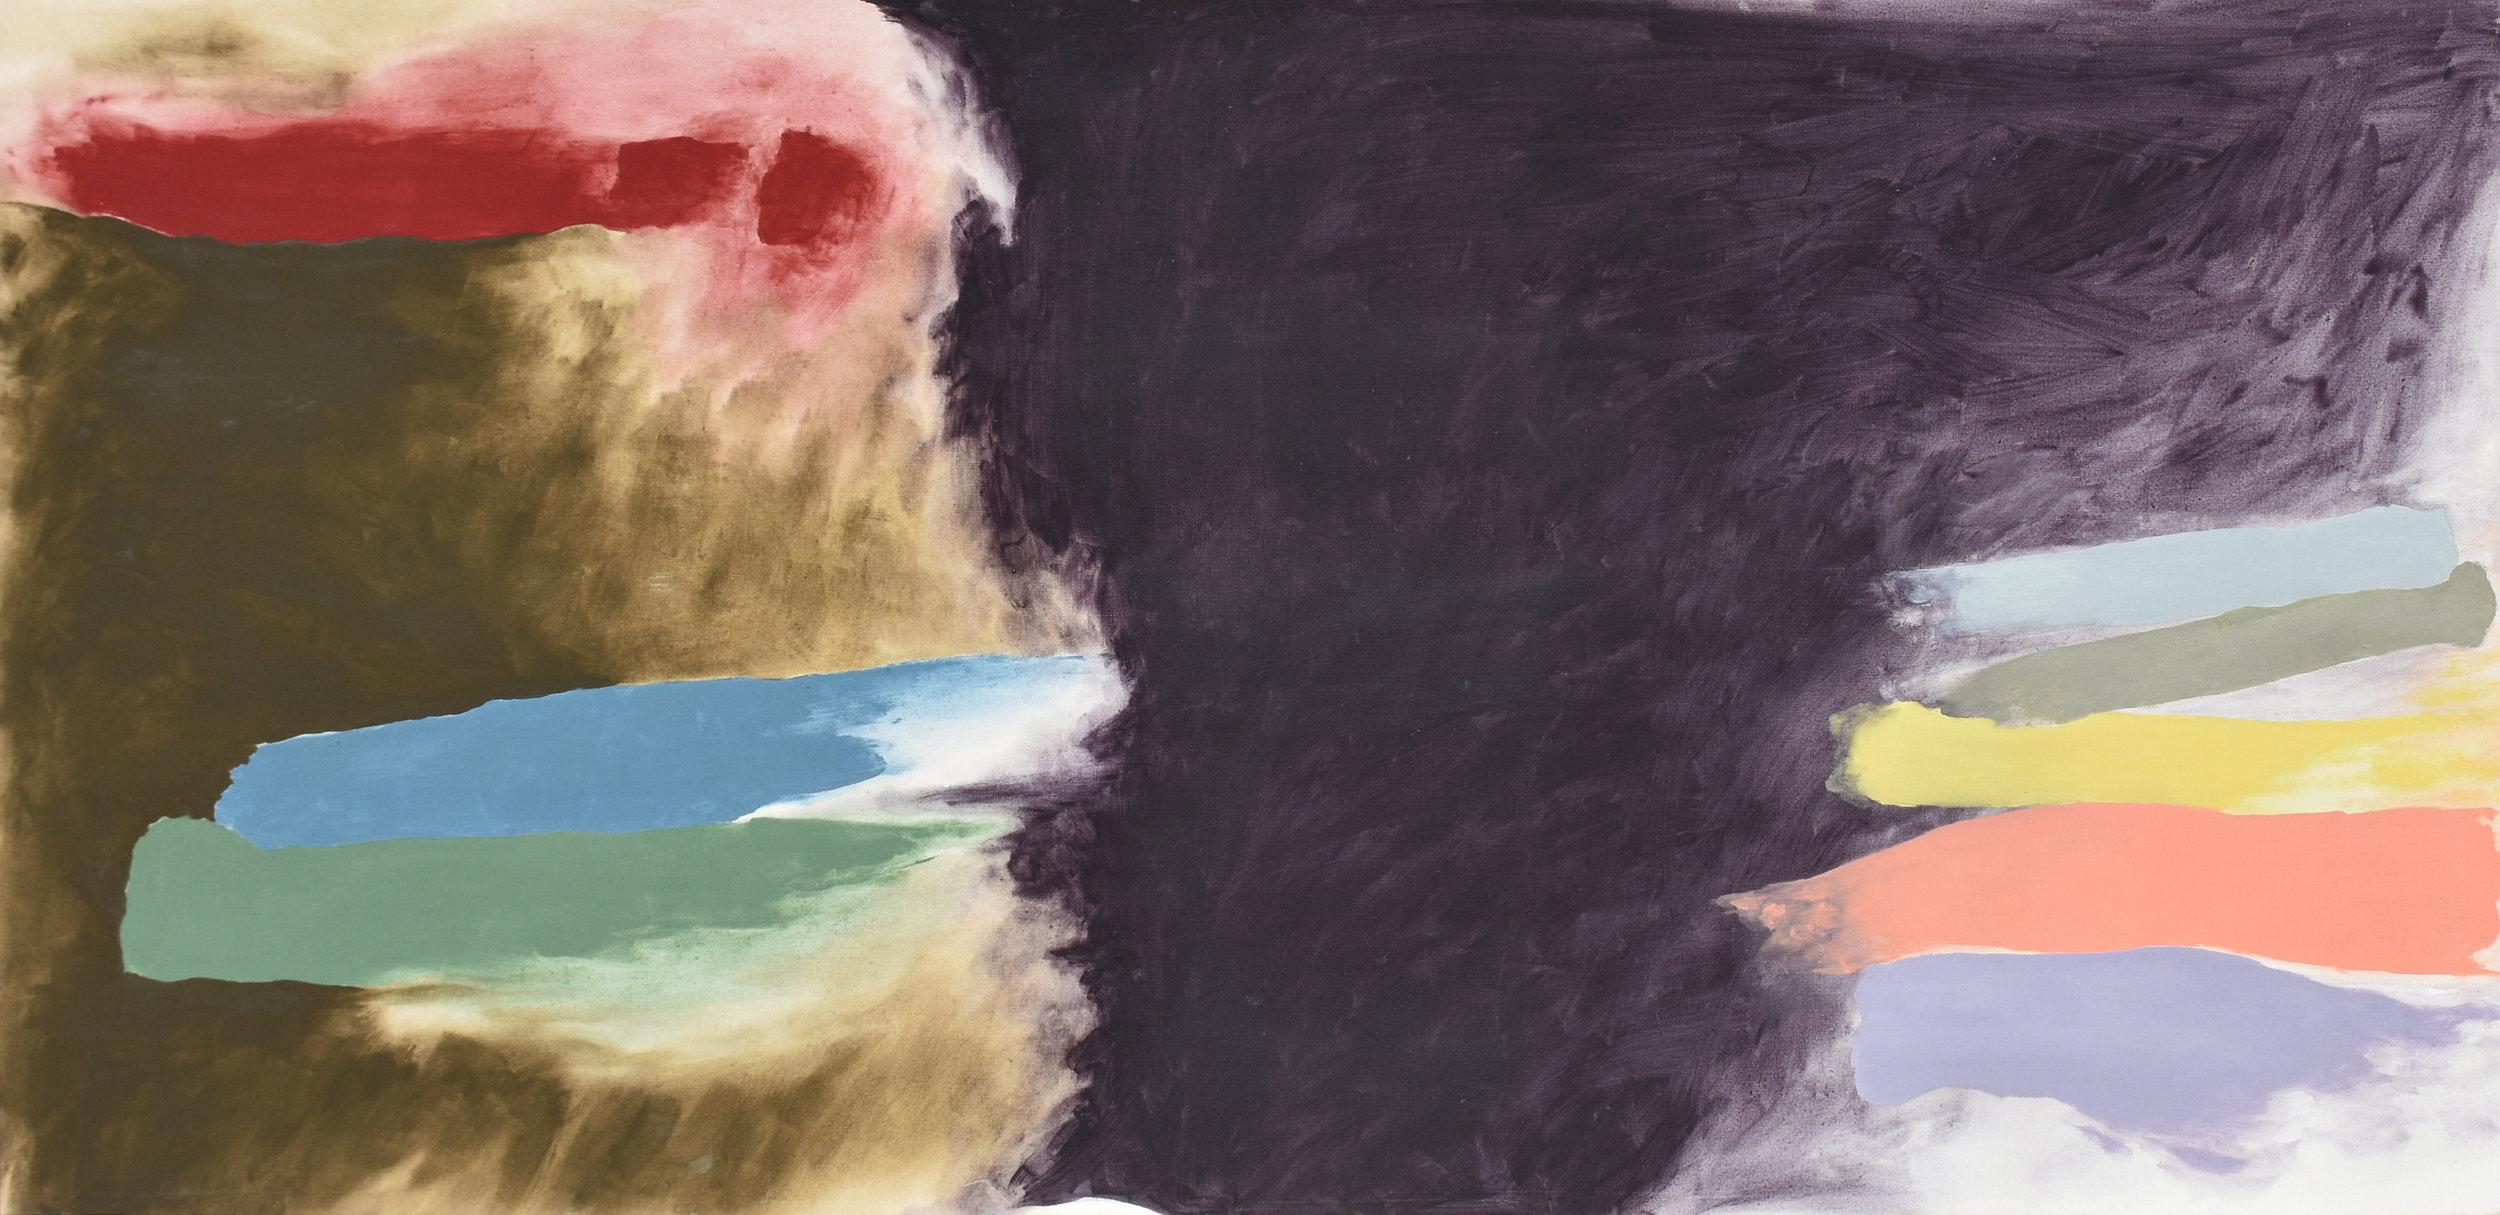 Borgia ,  Acrylic on canvas, c. 1979, 56 x 115 inches